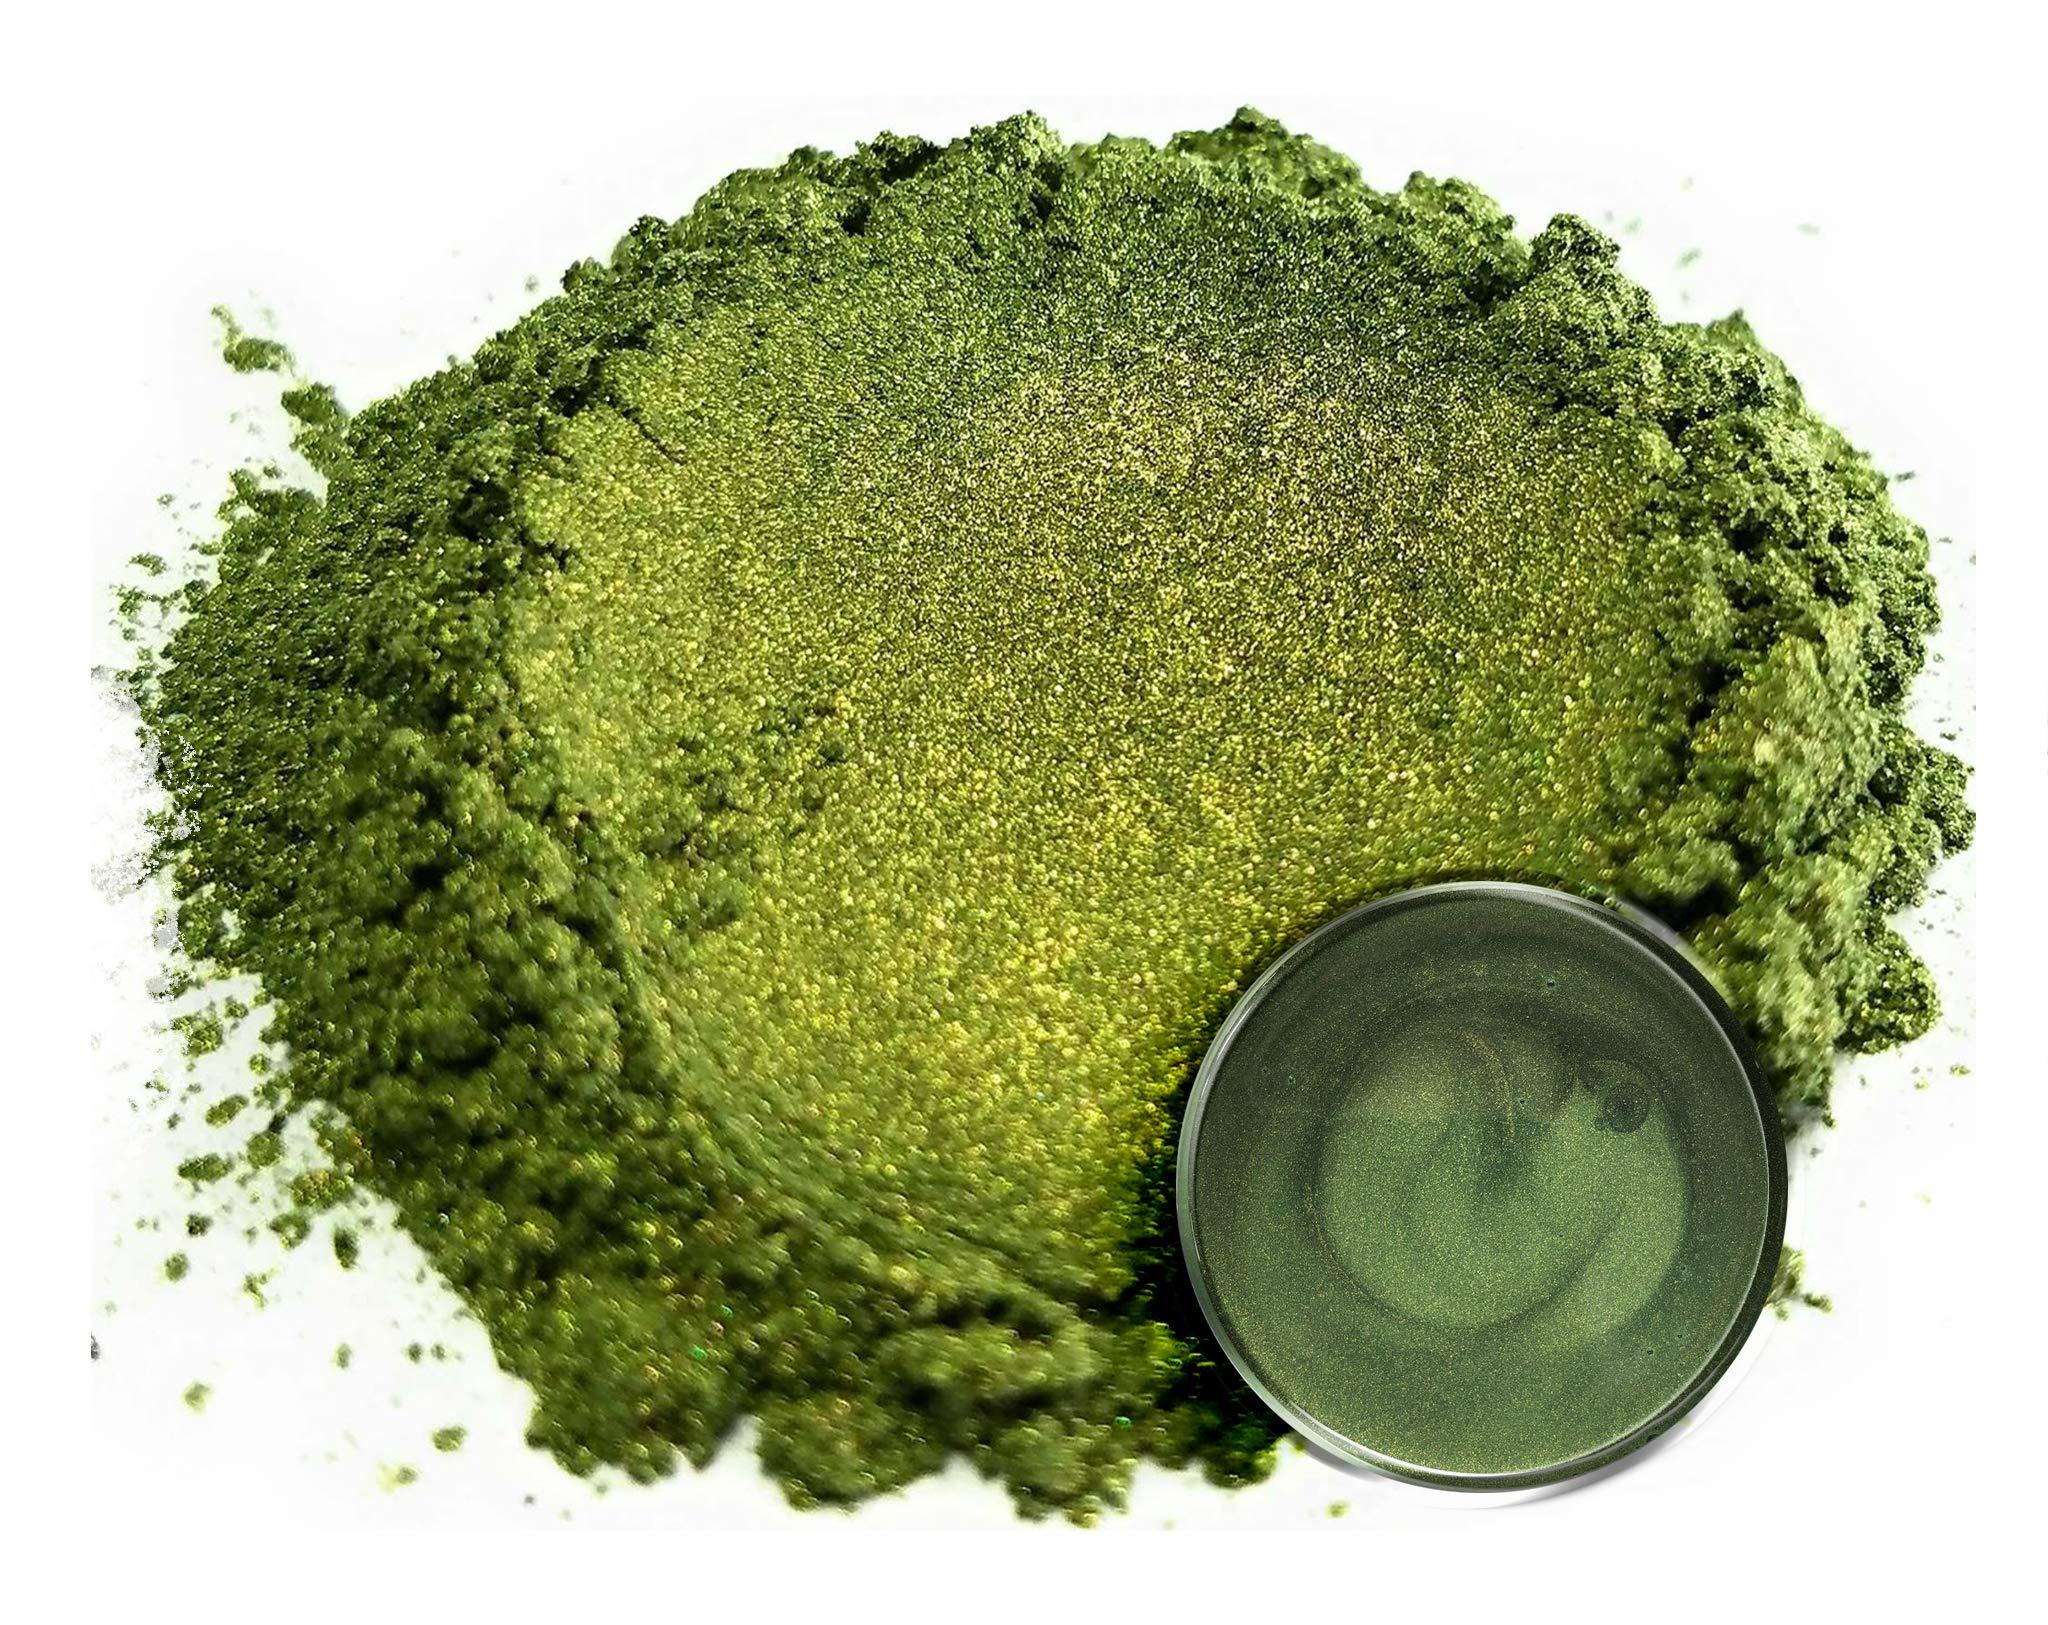 "Eye Candy Mica Powder Pigment ""Matcha Green"" (50g) Multipurpose DIY Arts and Crafts Additive | Natural Bath Bombs, Resin, Paint, Epoxy, Soap, Nail Polish, Lip Balm"